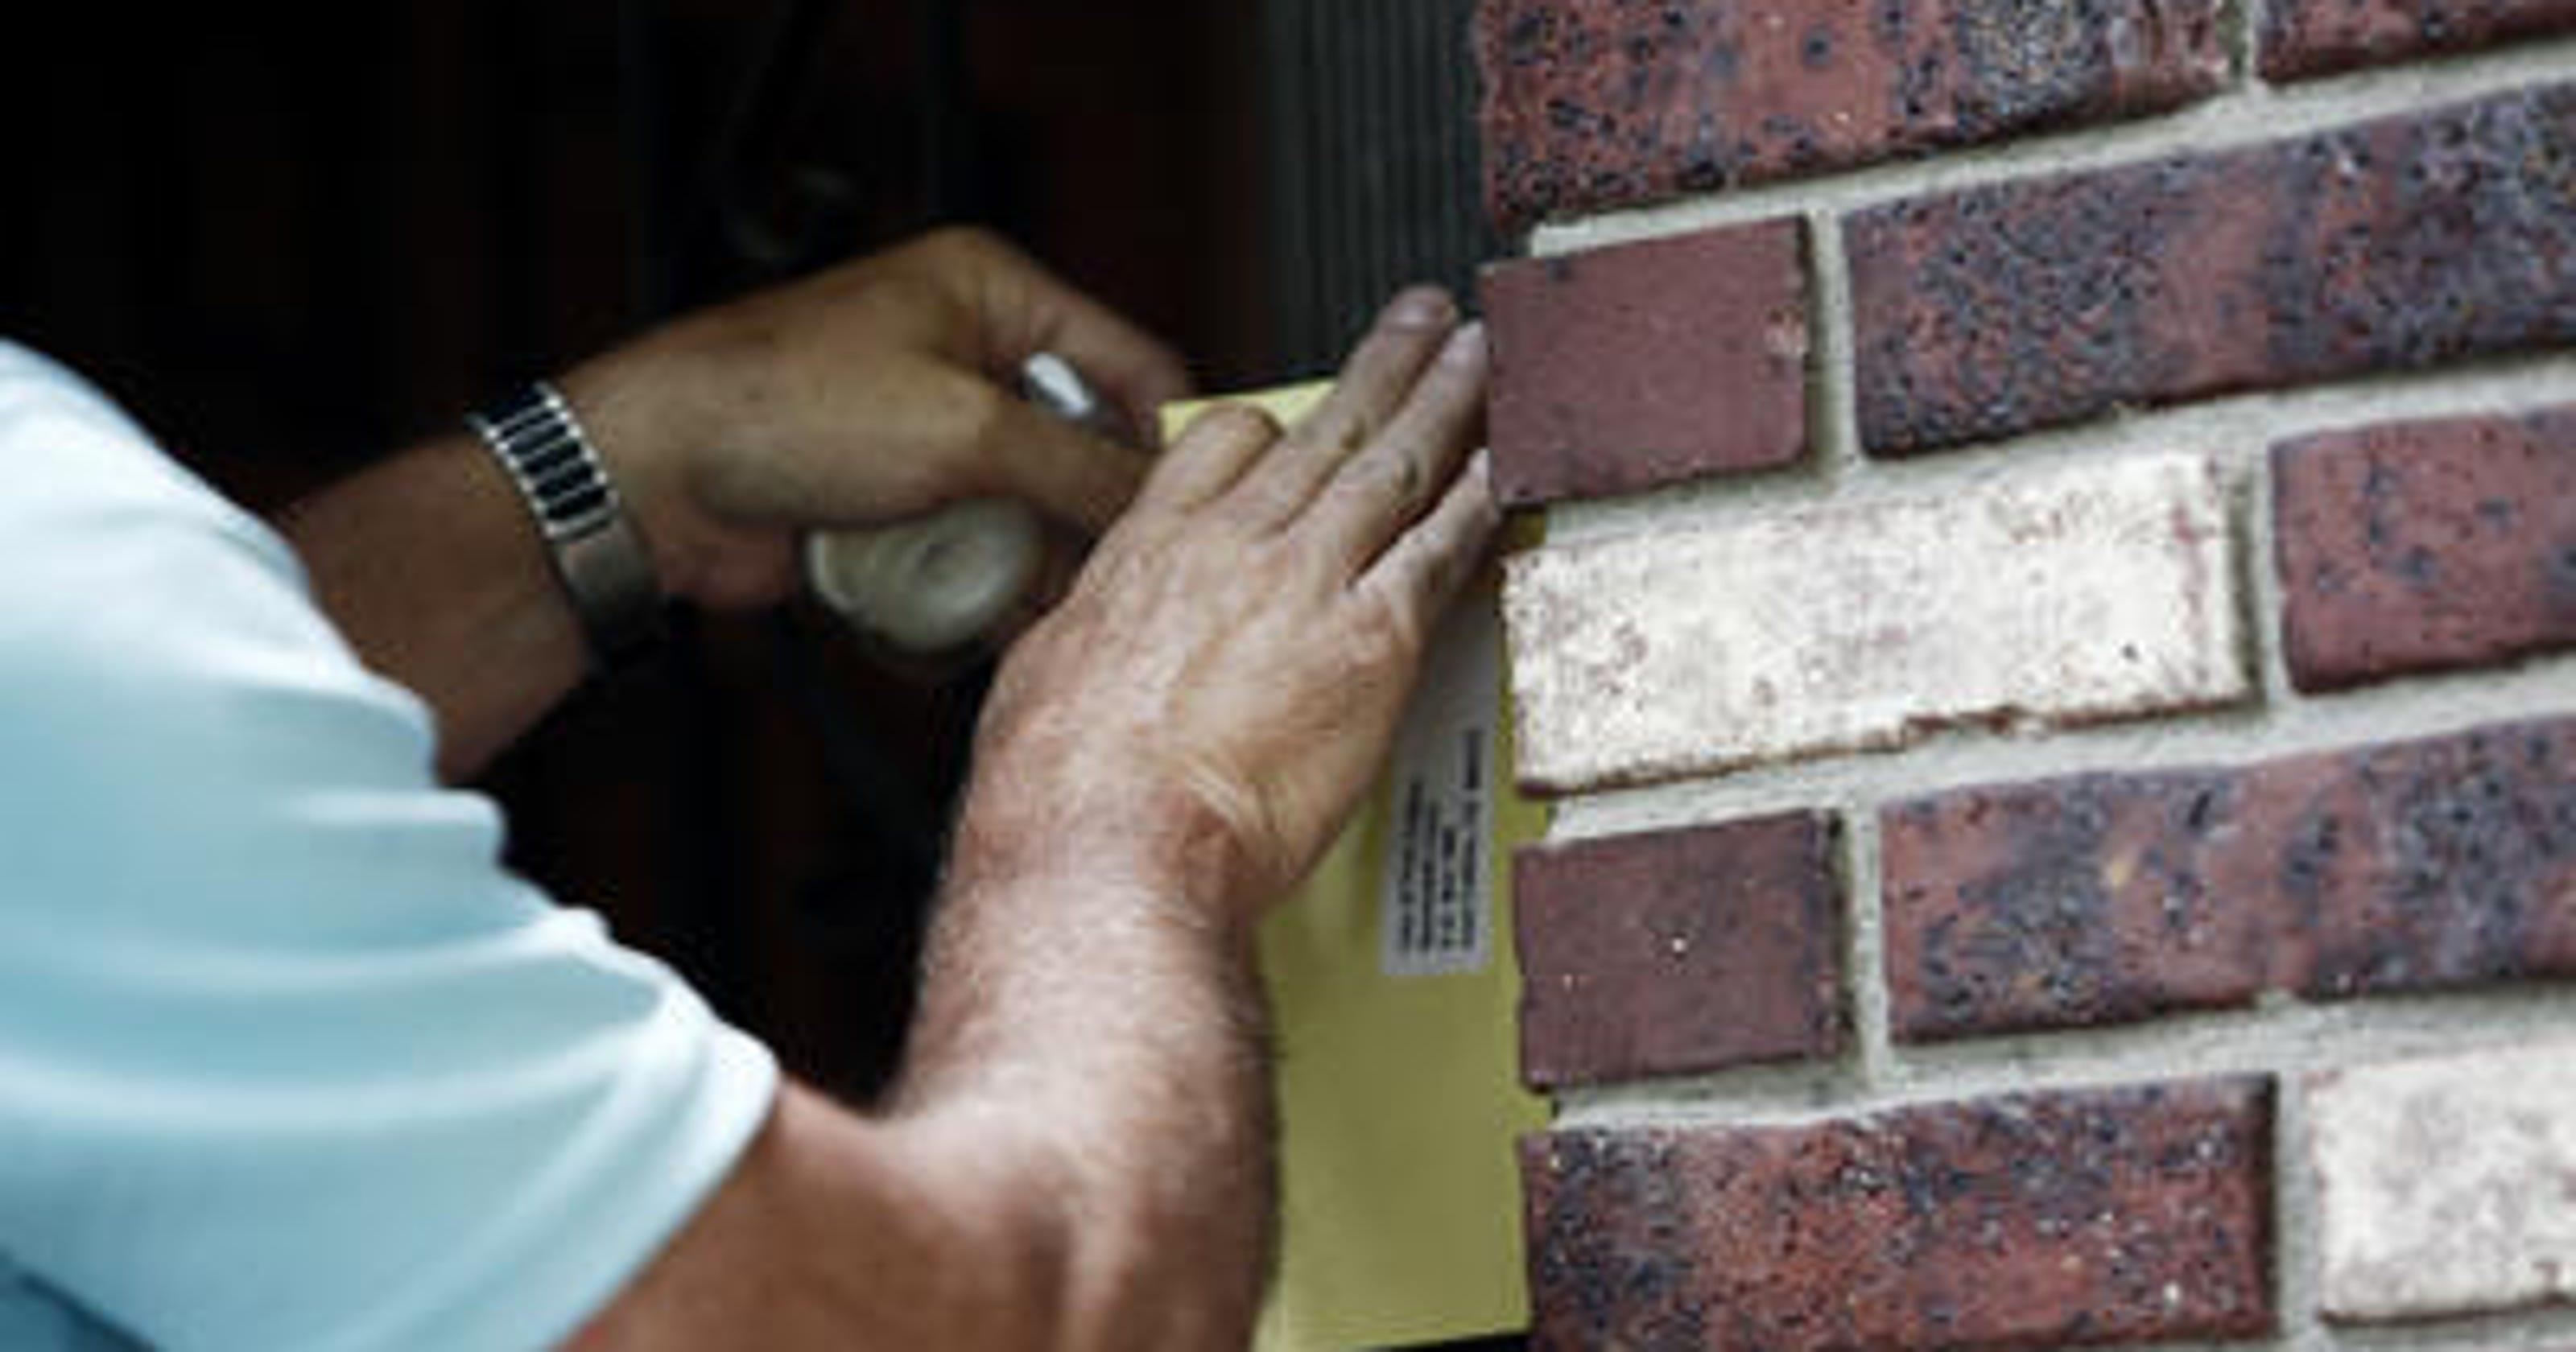 U+2 Fort Collins occupancy ordinance sets record, activists